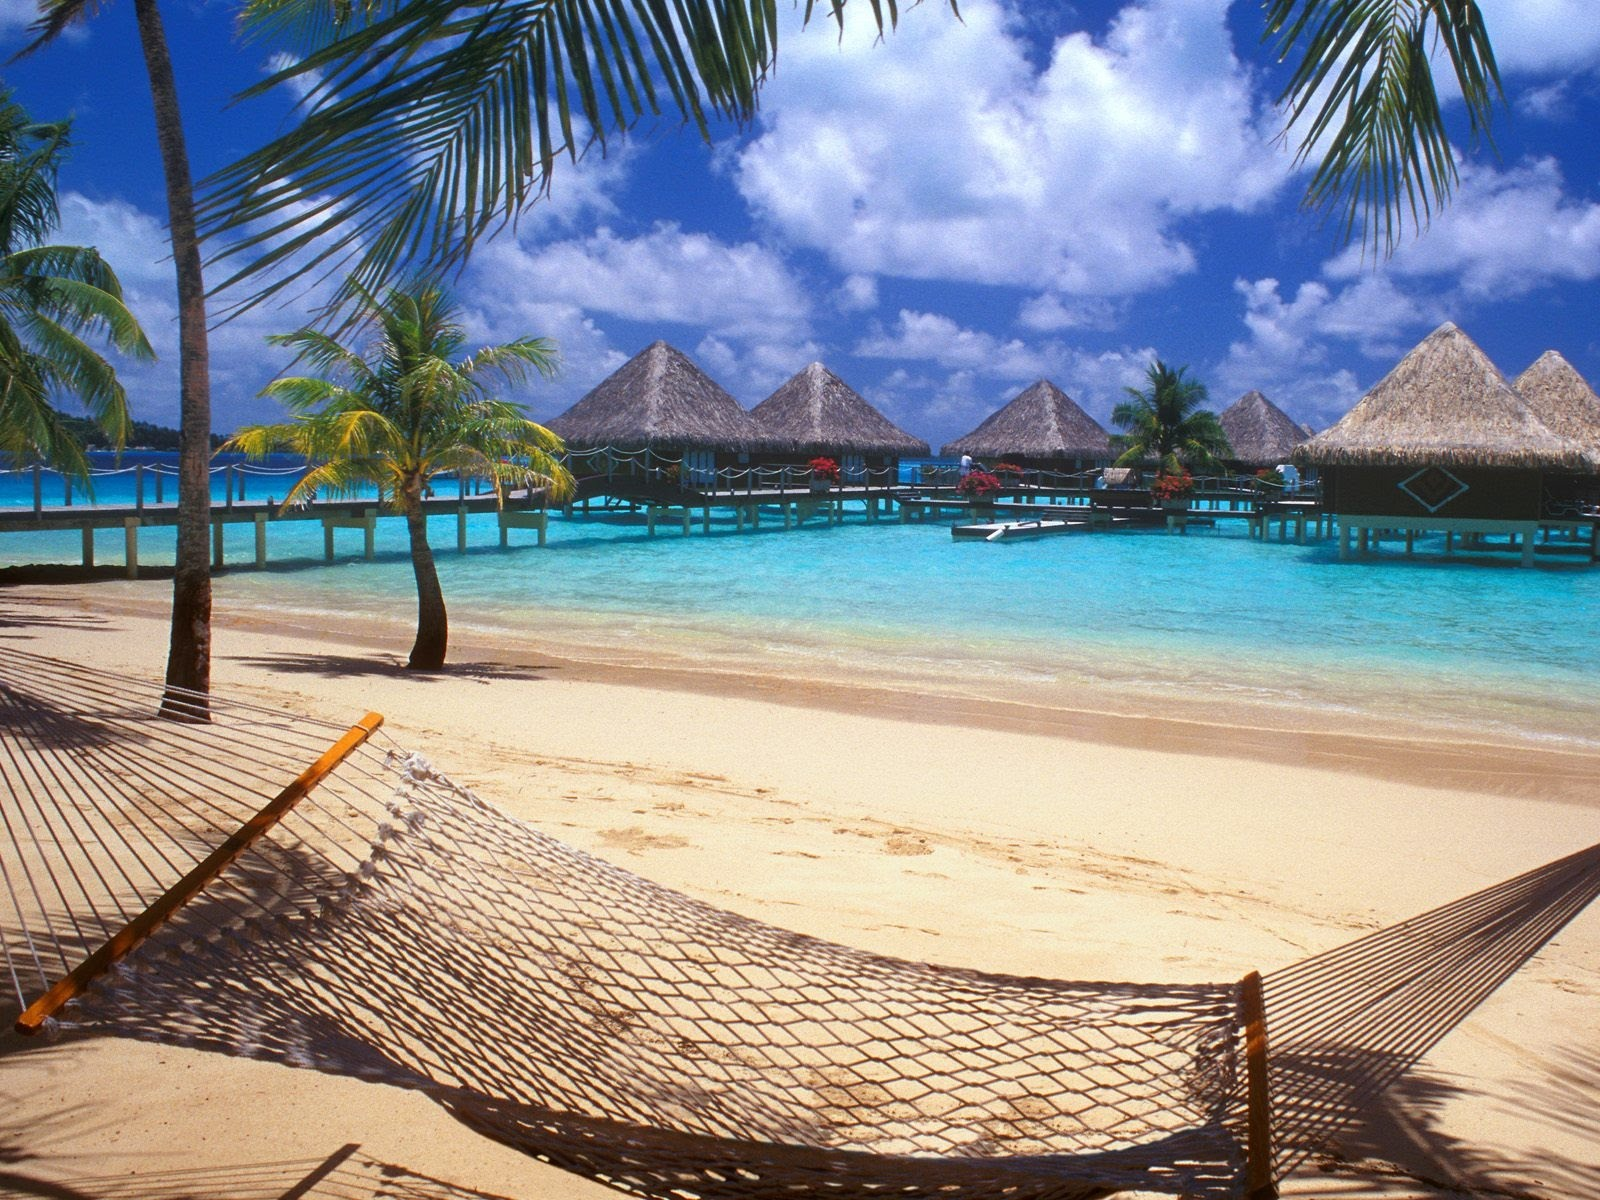 HD Bora Bora Wallpaper - WallpaperSafari